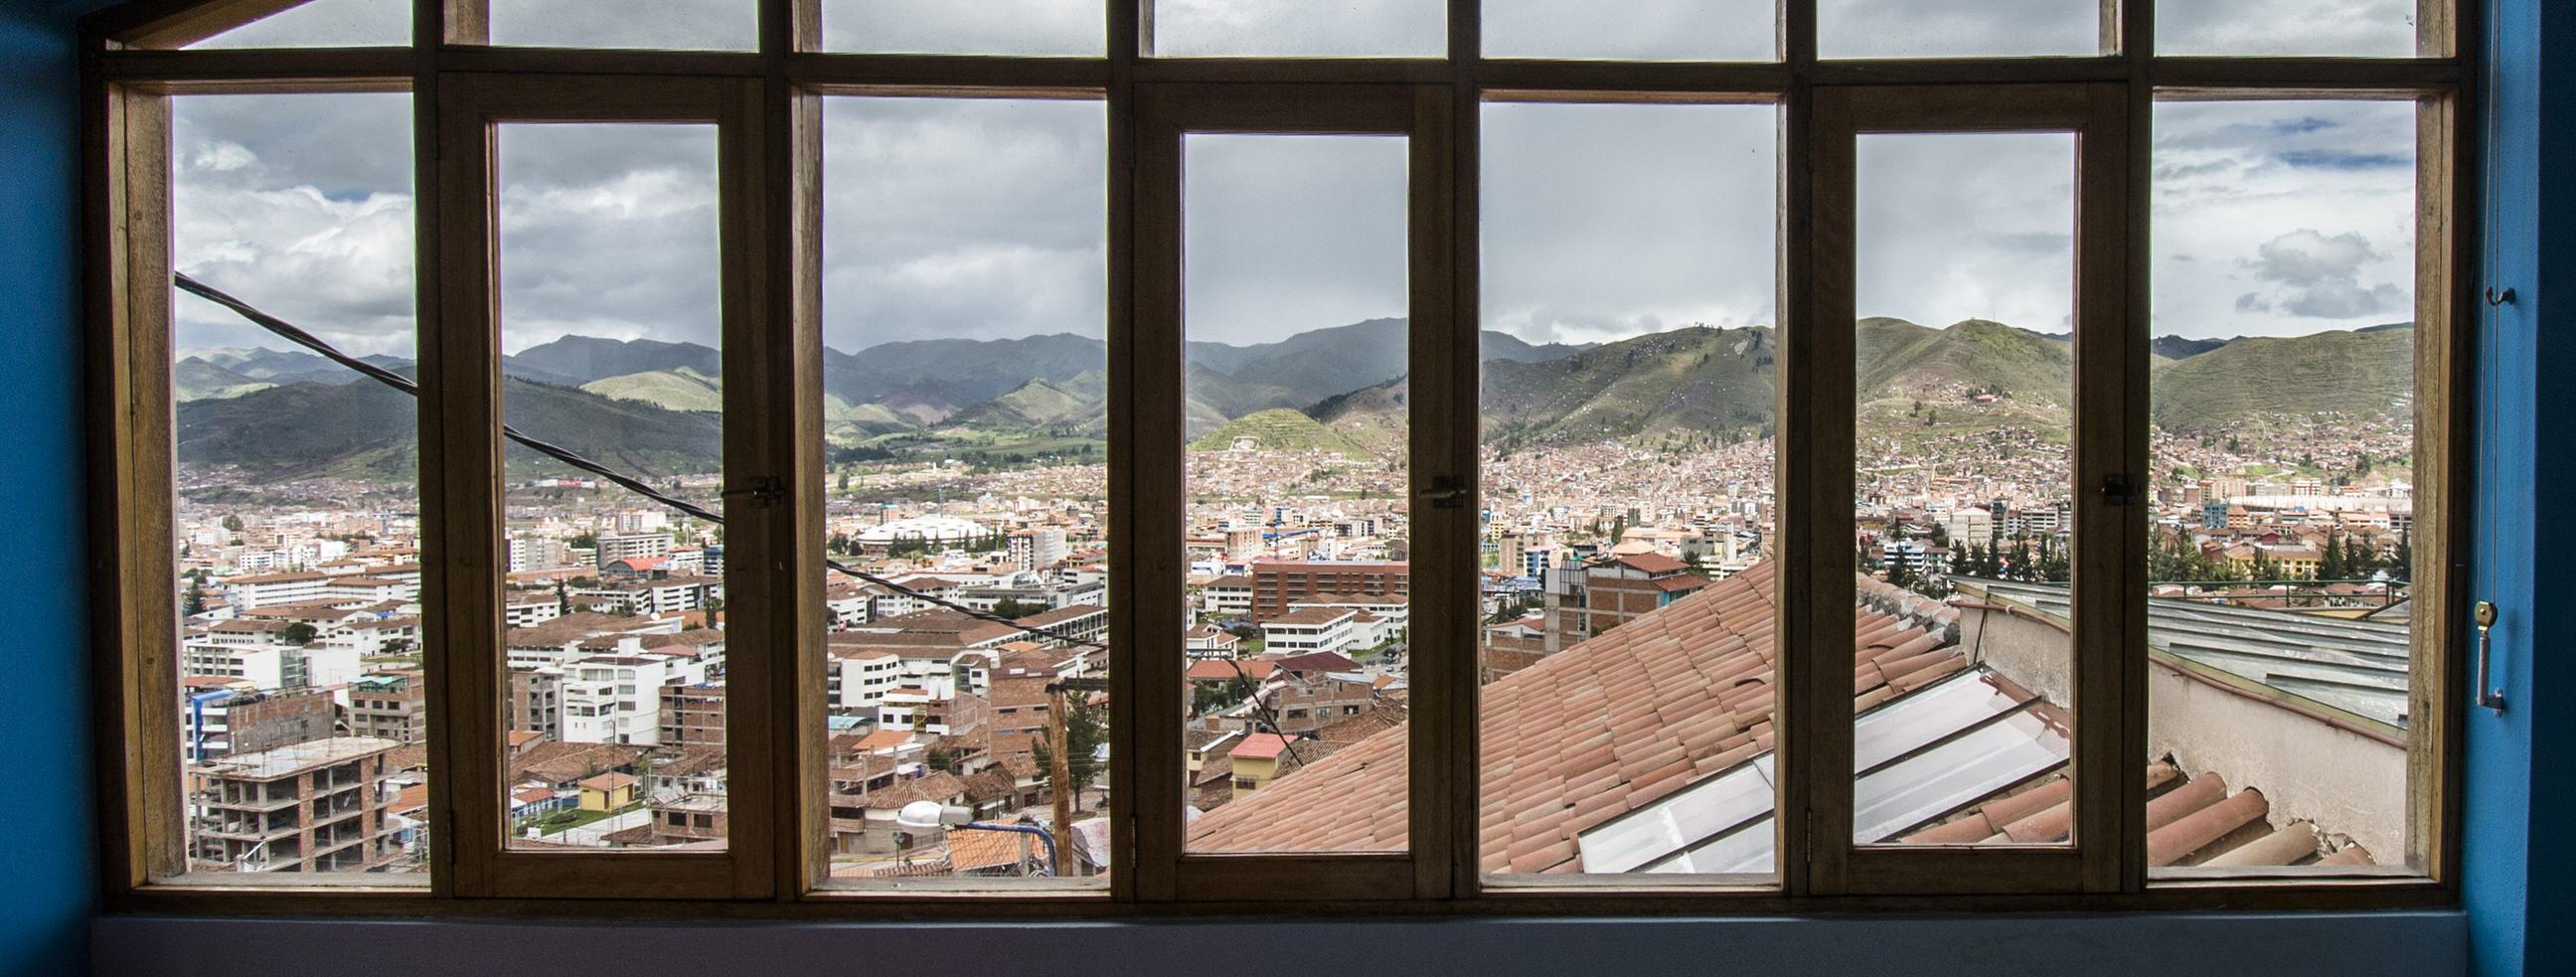 Ostello Cusco Caith Turismo responsabile e Solidale Peruresponsabile22-1.jpg